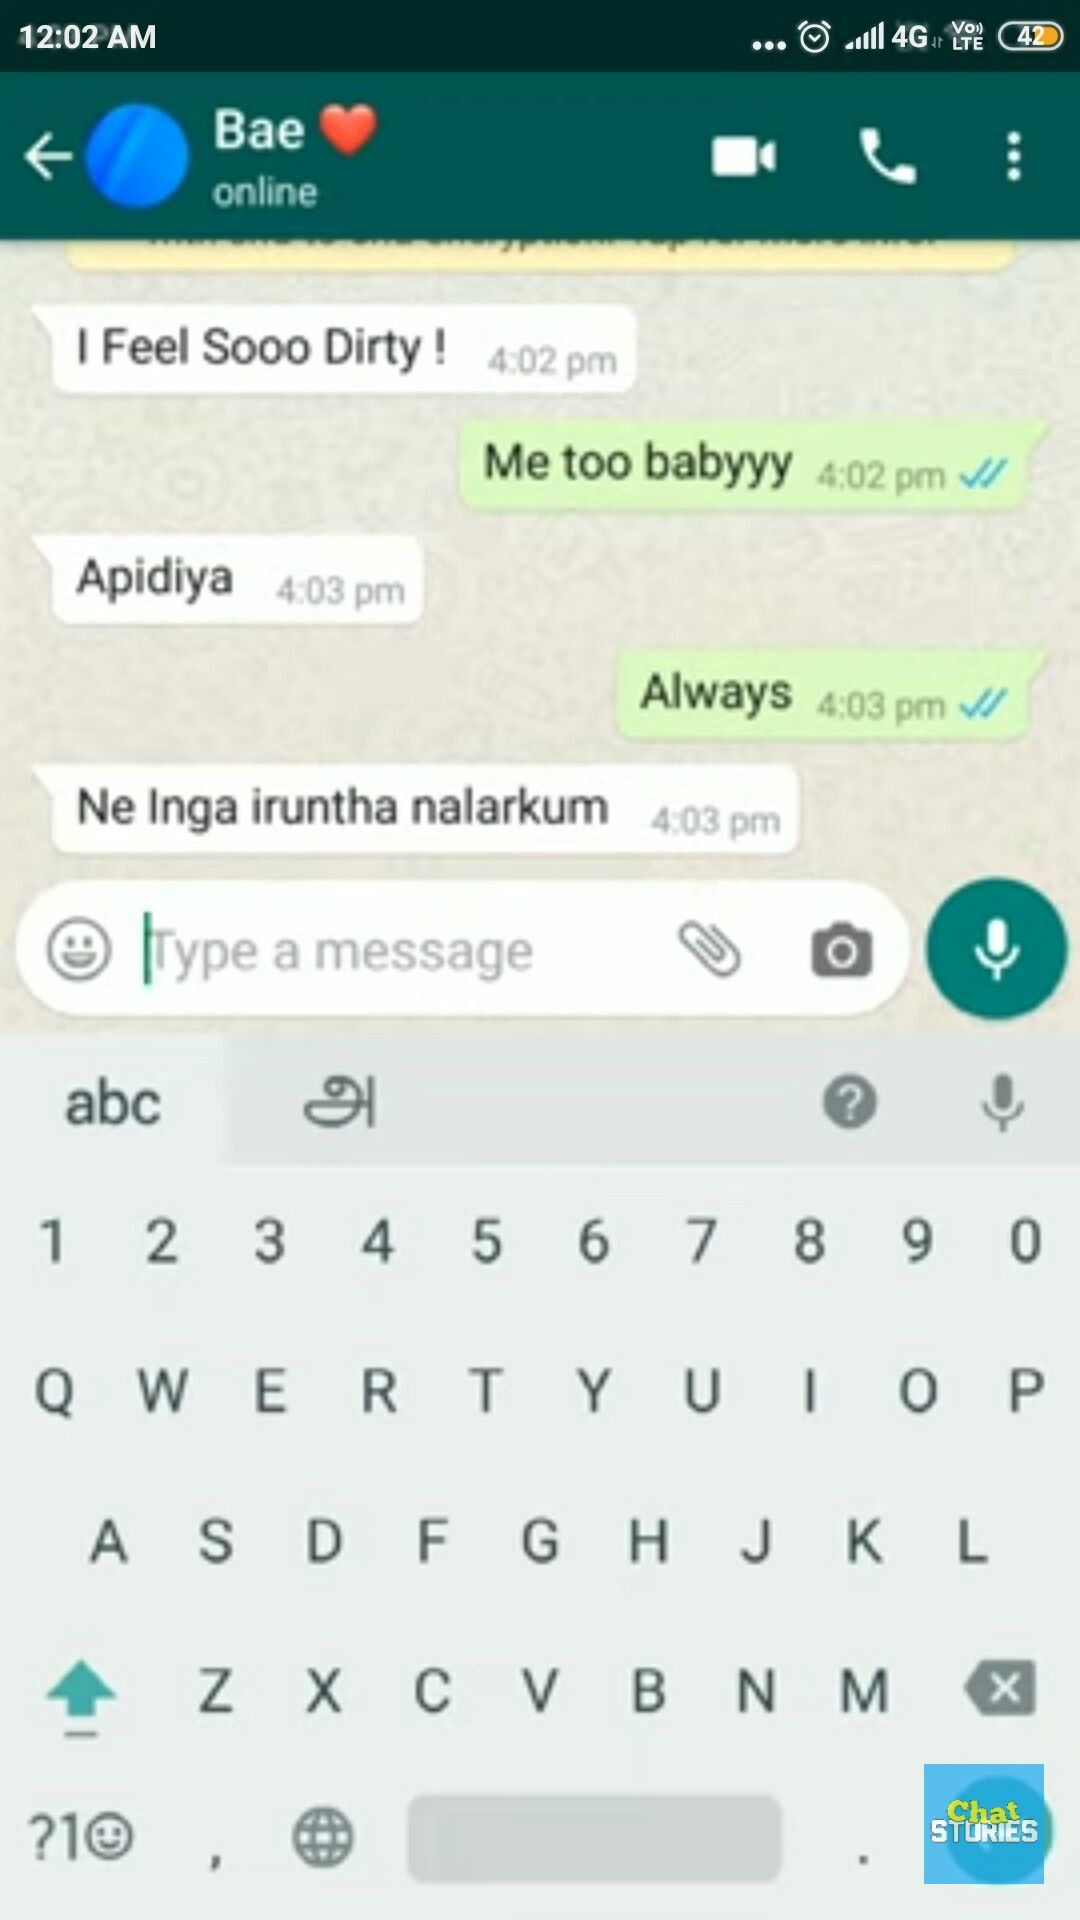 Messages whatsapp sexy 50+ WhatsApp